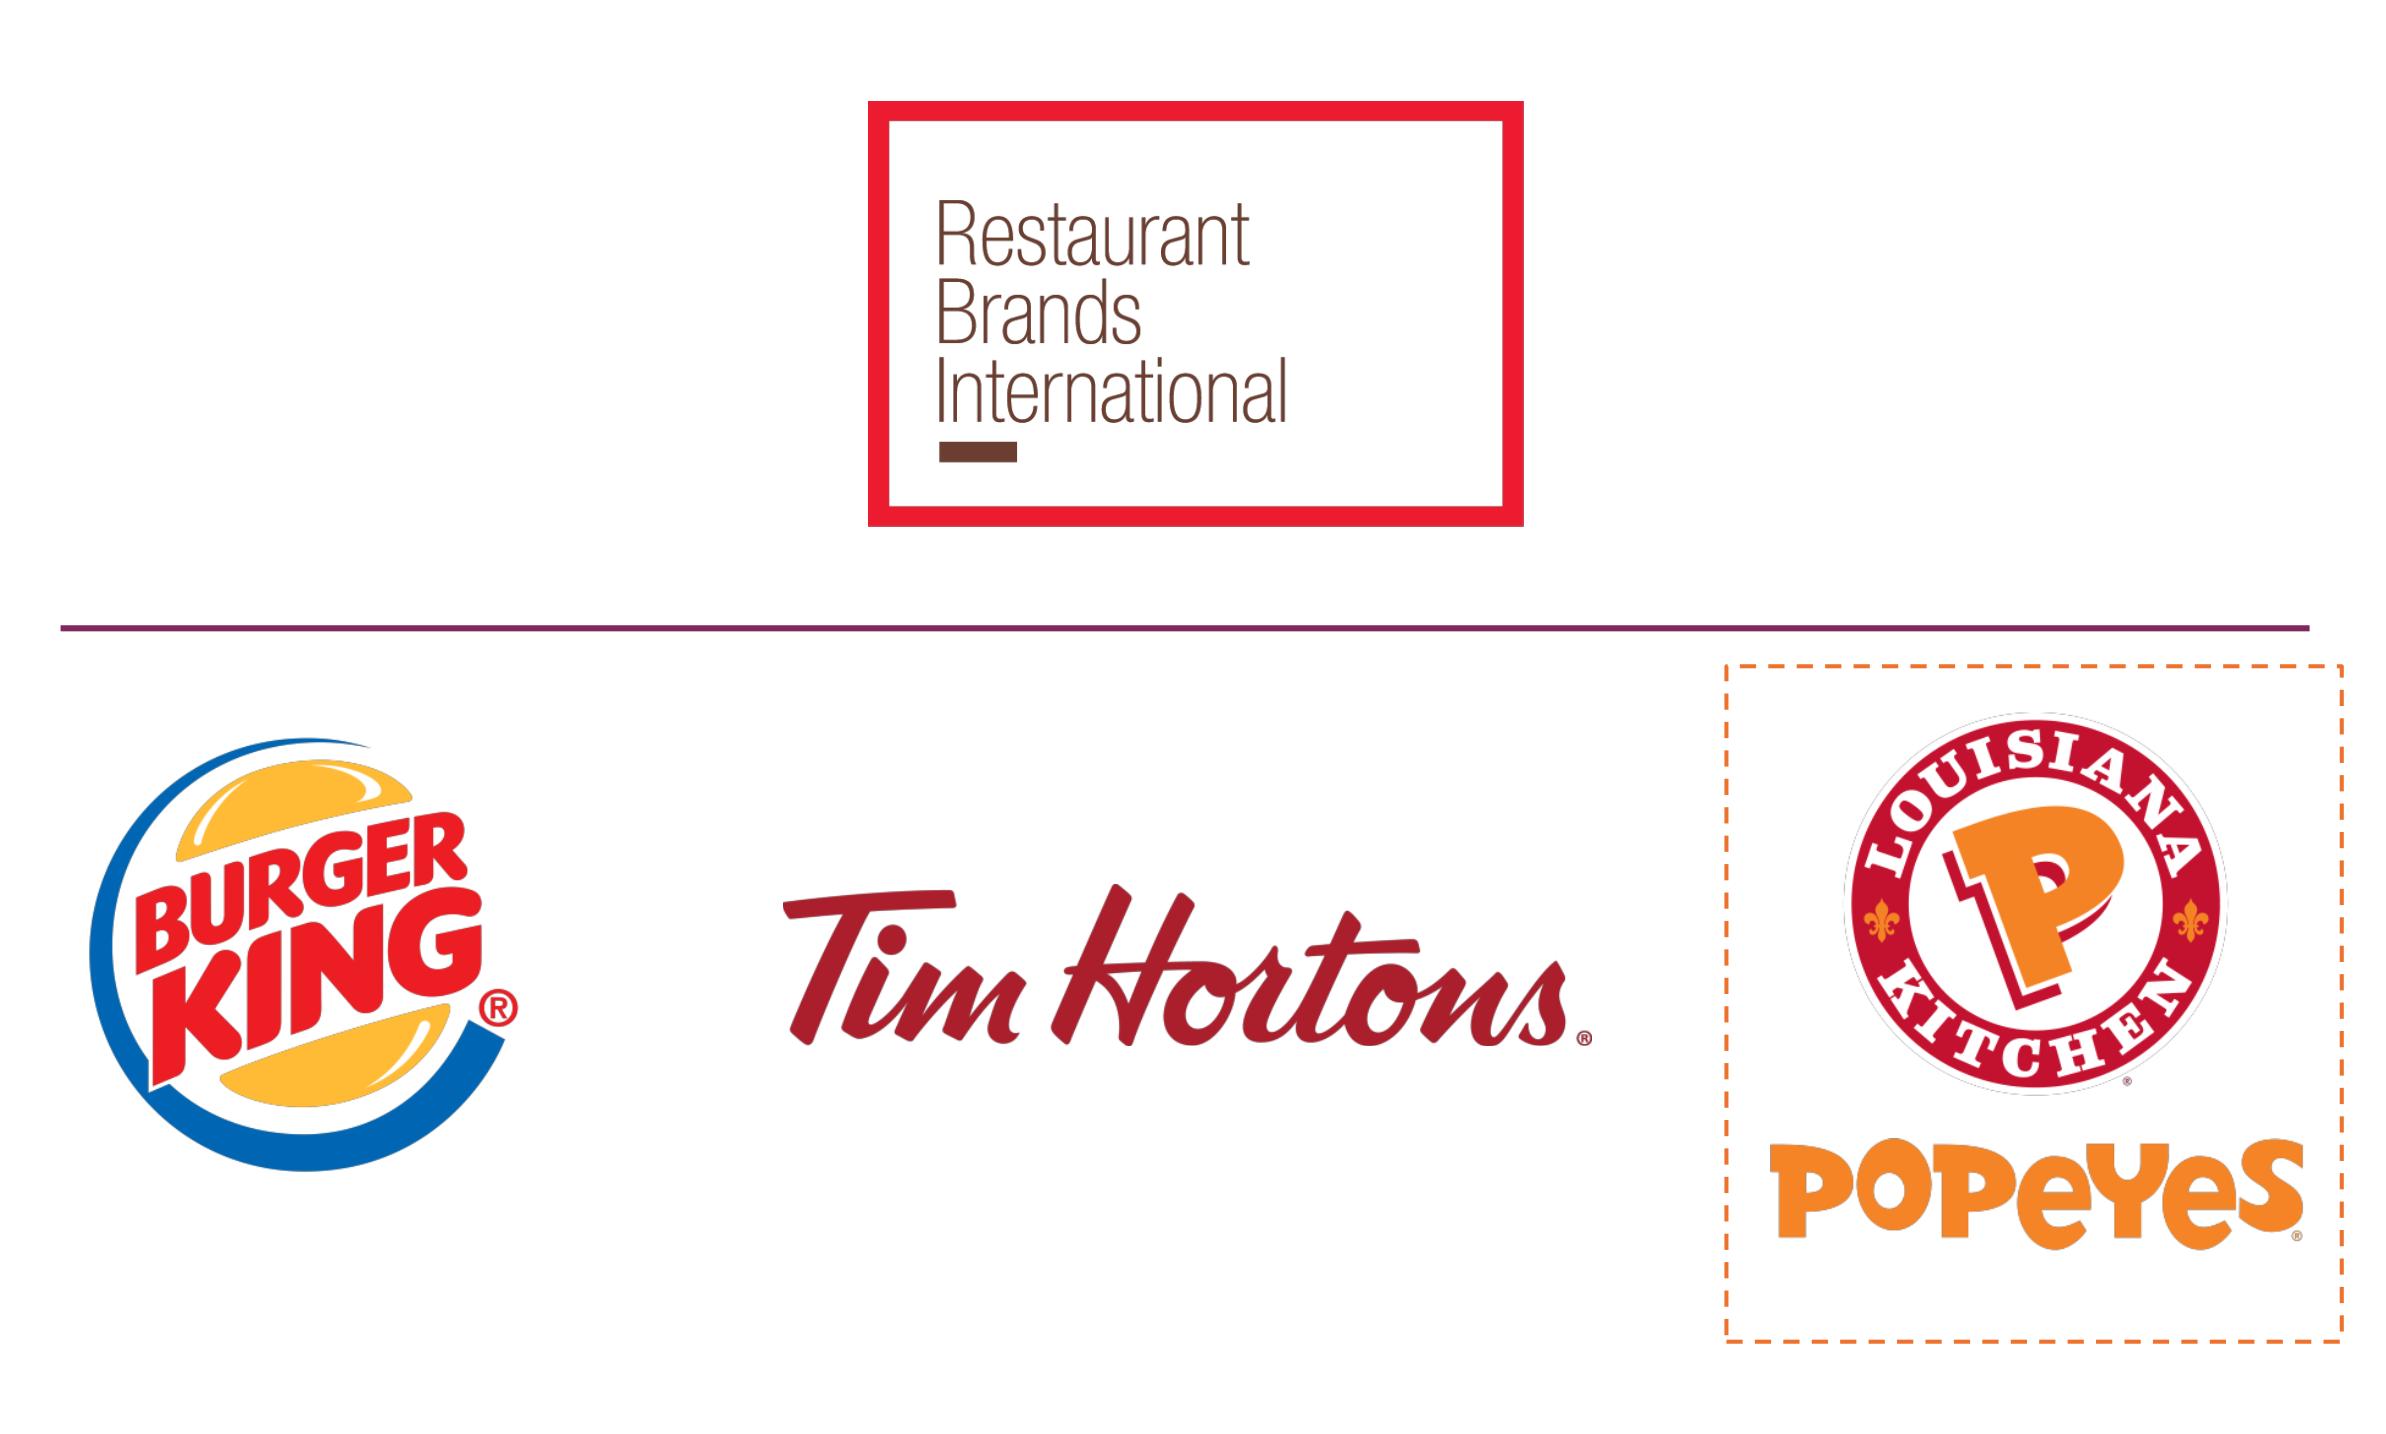 Burger King, Tim Horton's, and Popeye's corporate logos below the Restaurant Brands logo